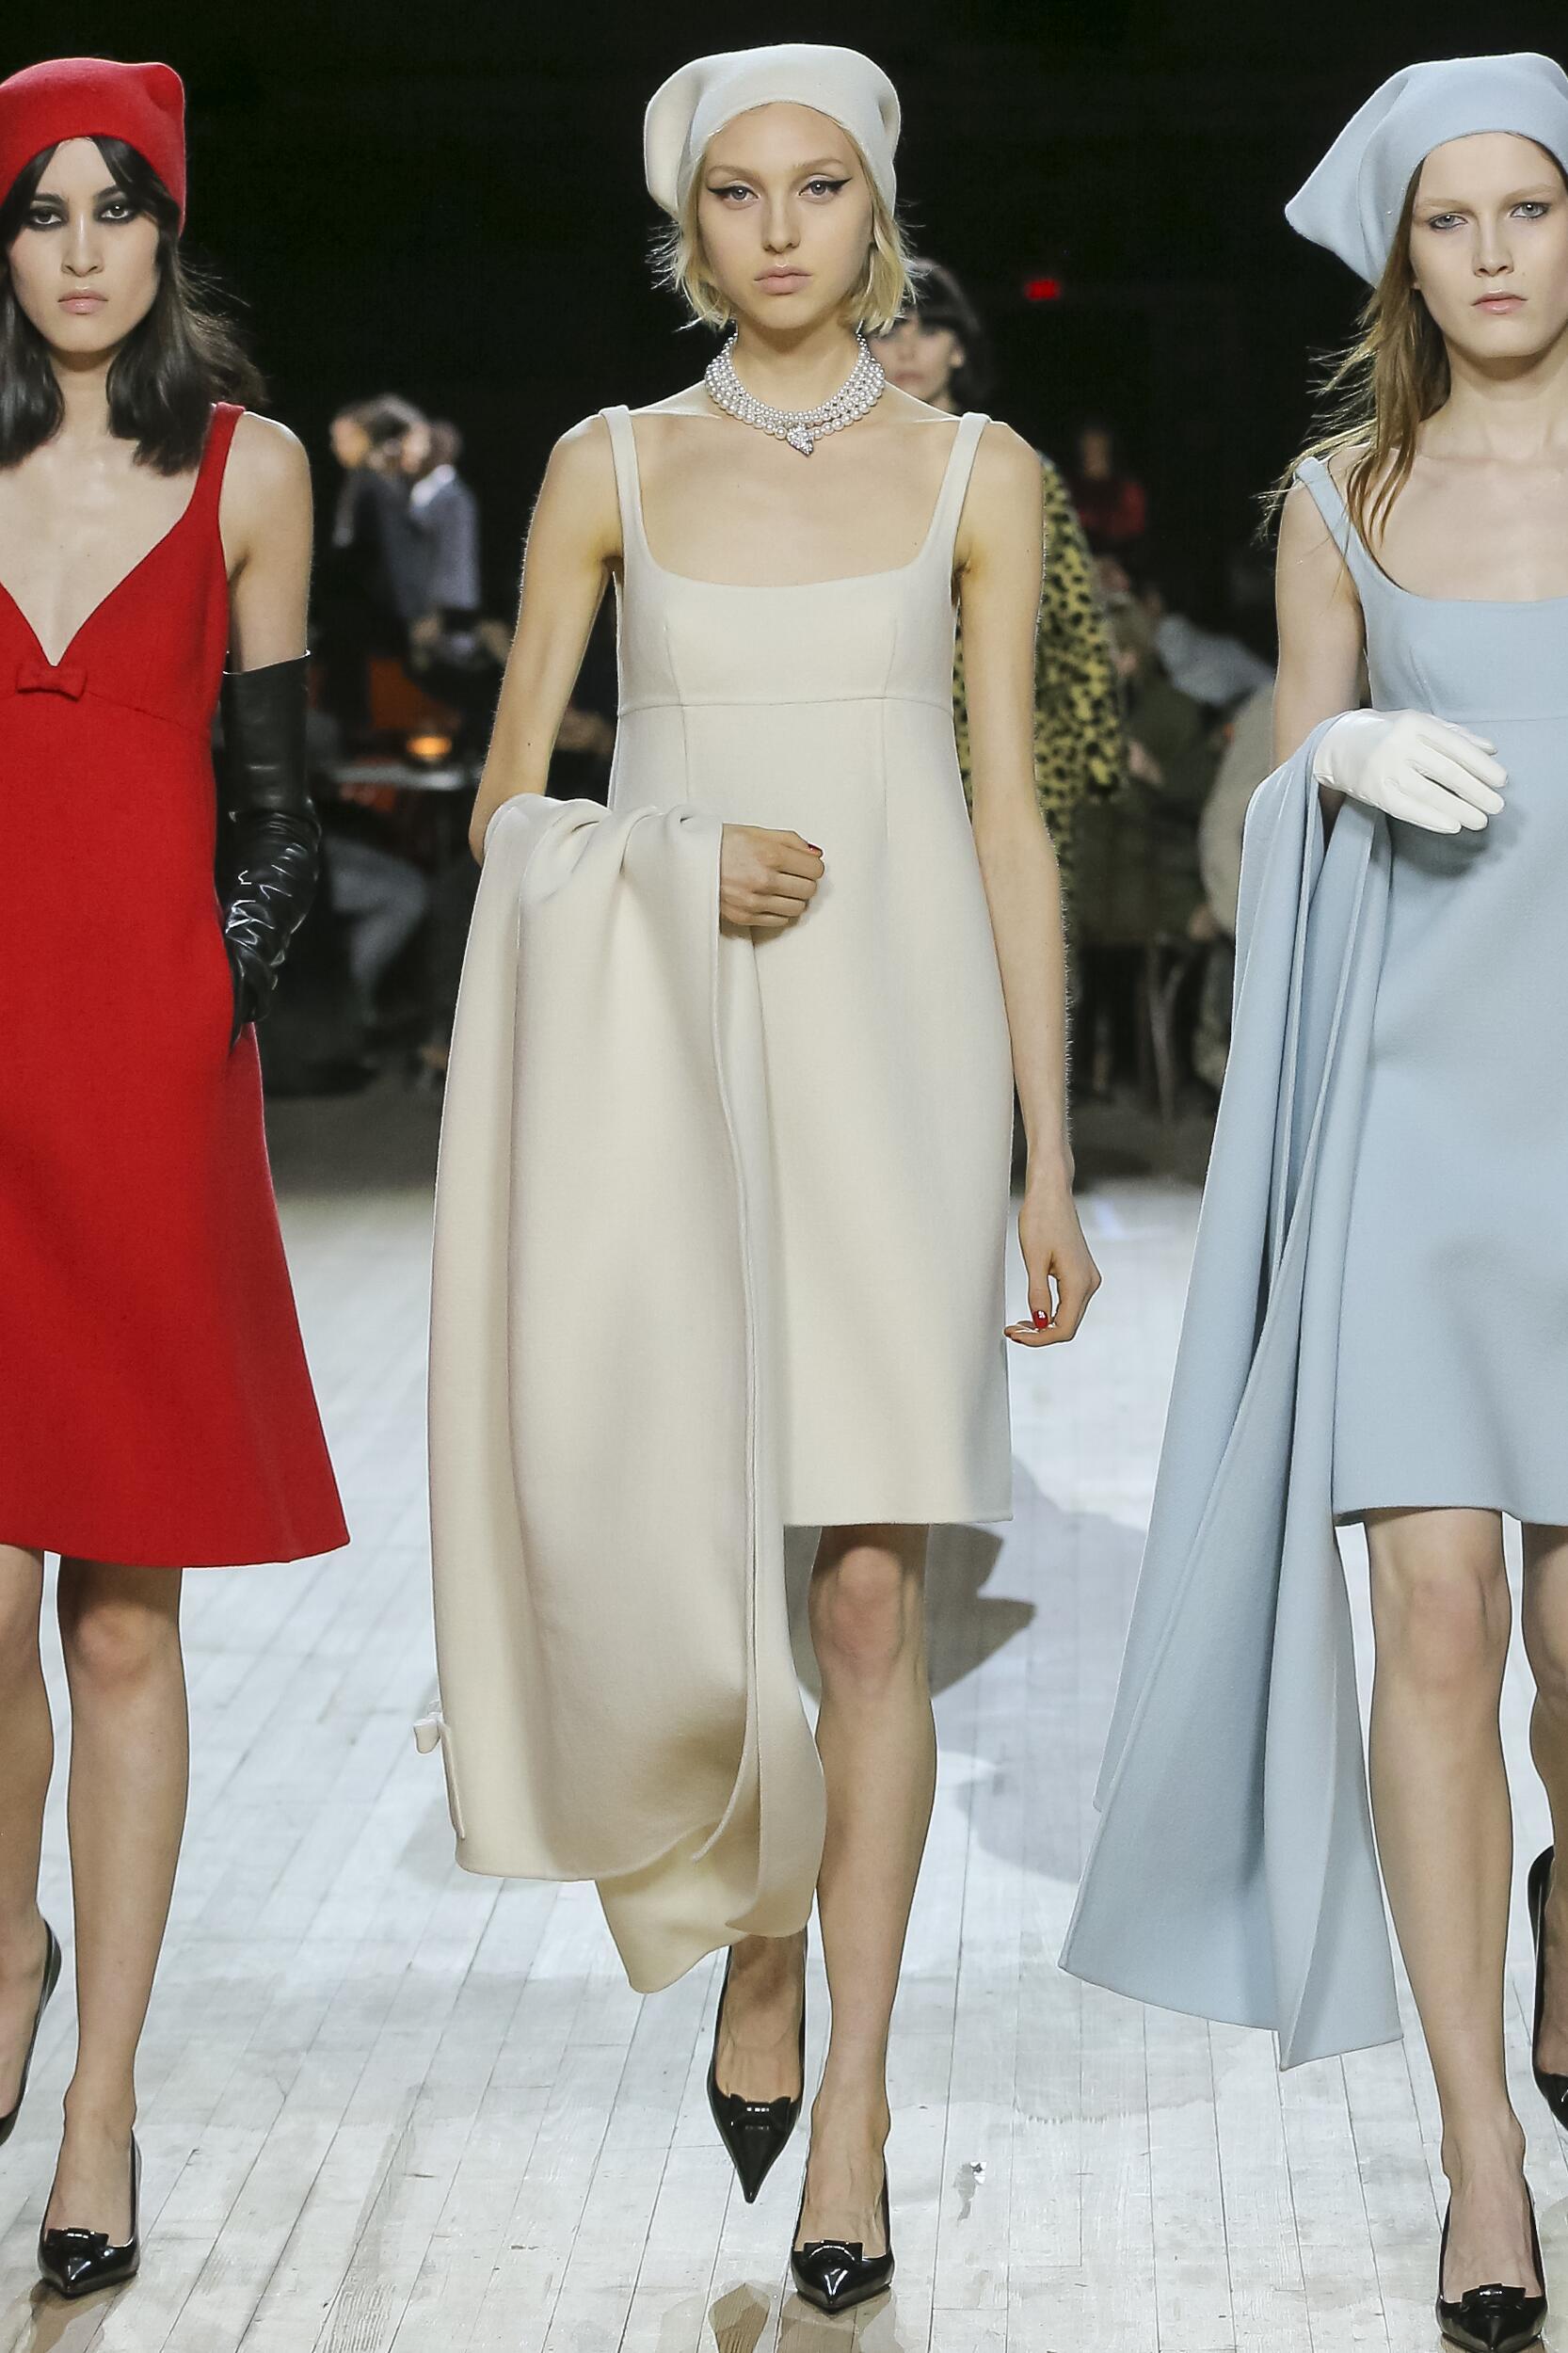 Fashion Model Marc Jacobs Catwalk